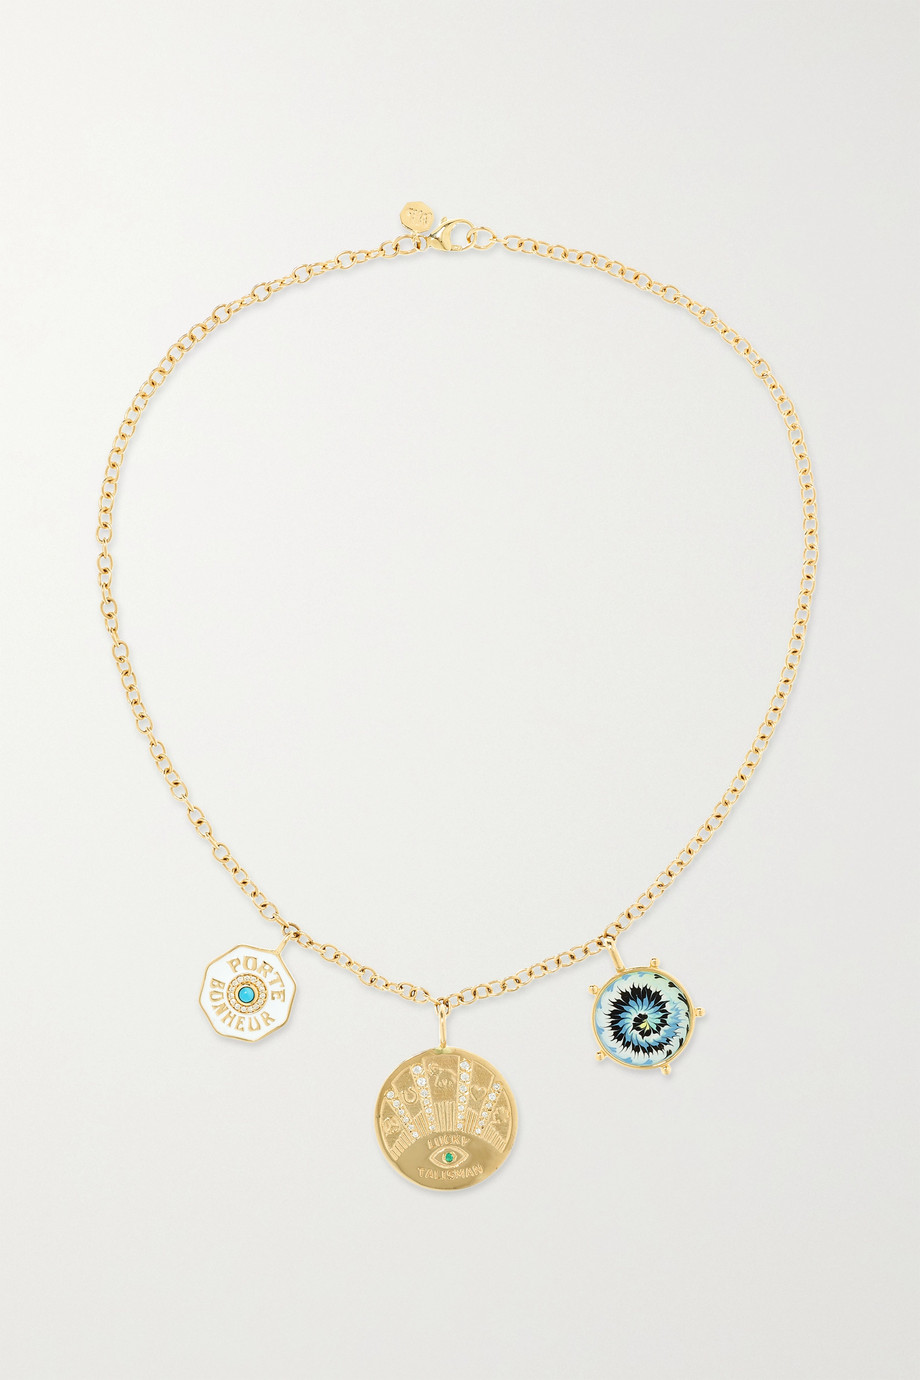 Marlo Laz Coin 14-karat gold multi-stone necklace